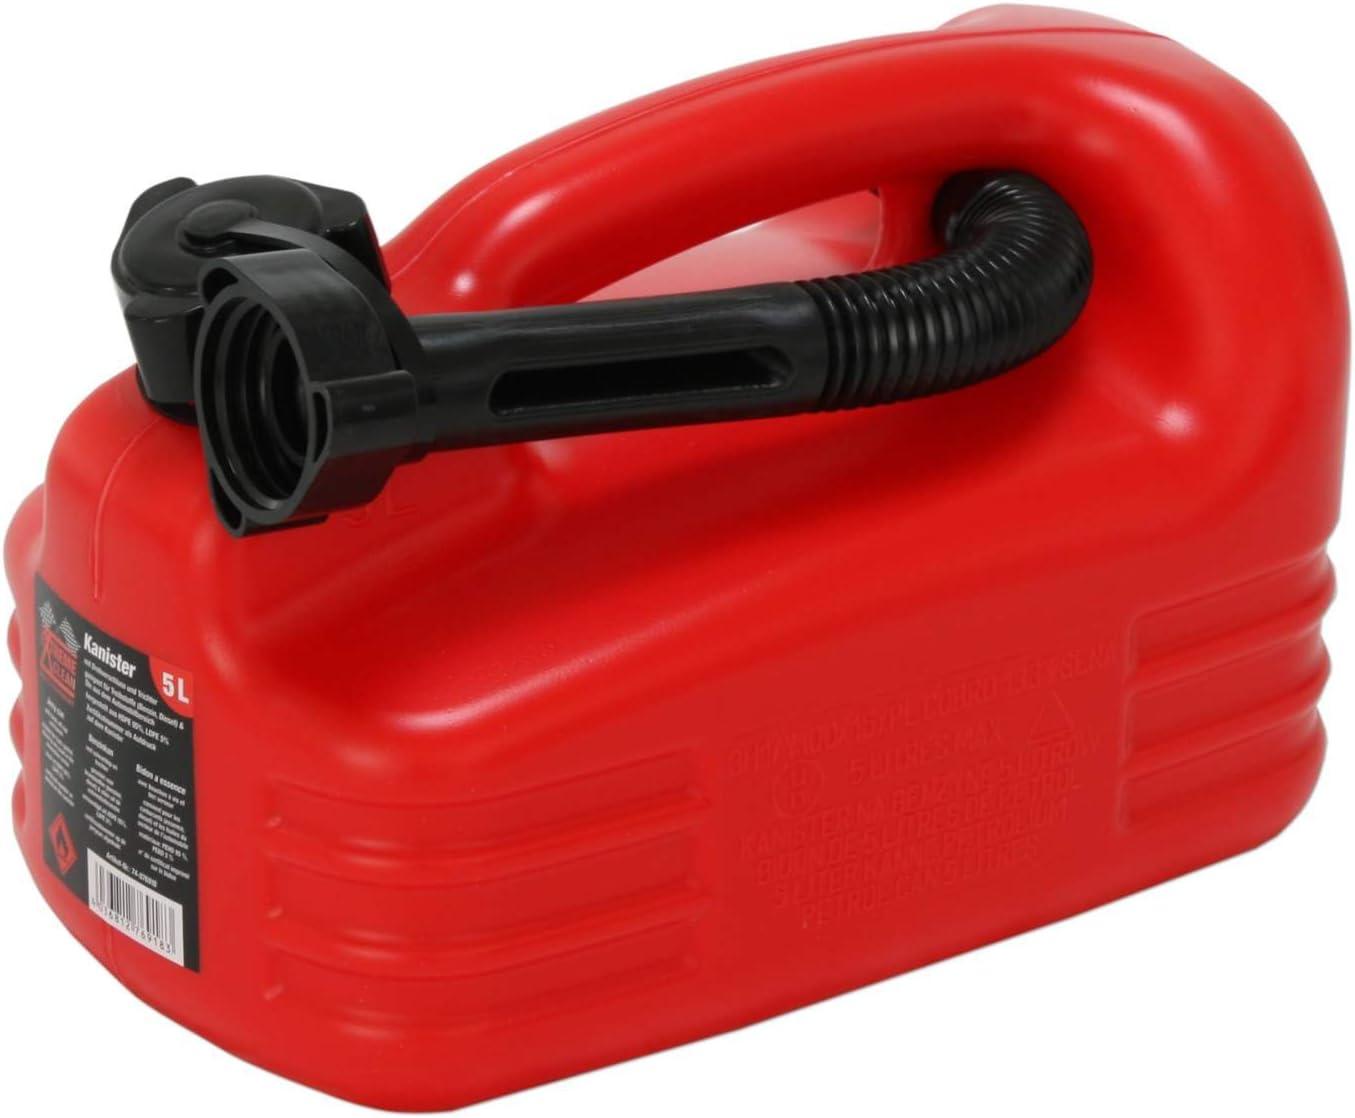 Benzinkanister schwarz 5 Liter Kraftstoff Reserve Kanister